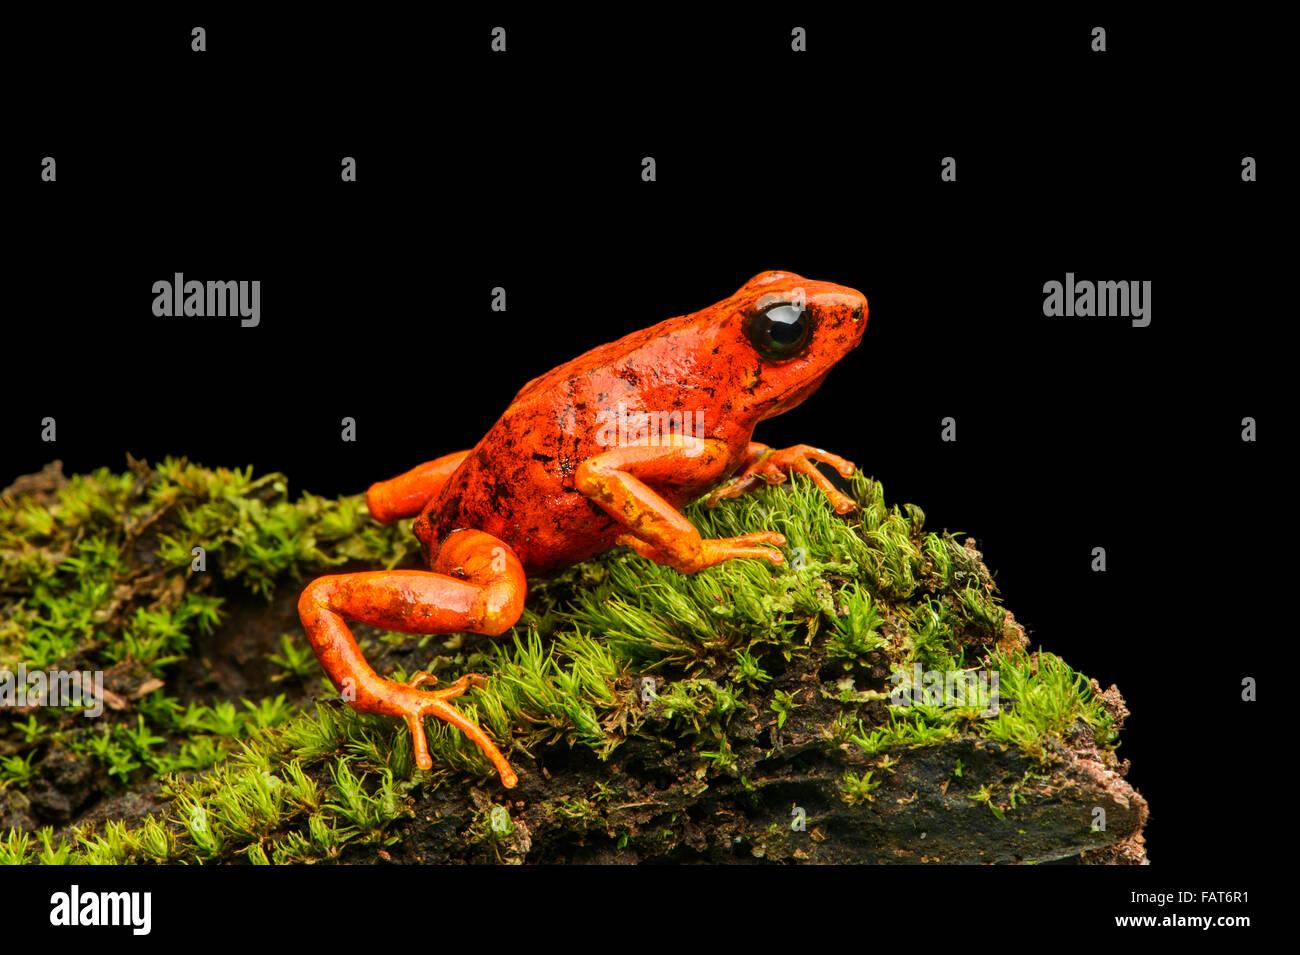 Little-devil poison frog or diablito (Oophaga sylvatica) on moss, Chocó rainforest, Ecuador - Stock Image